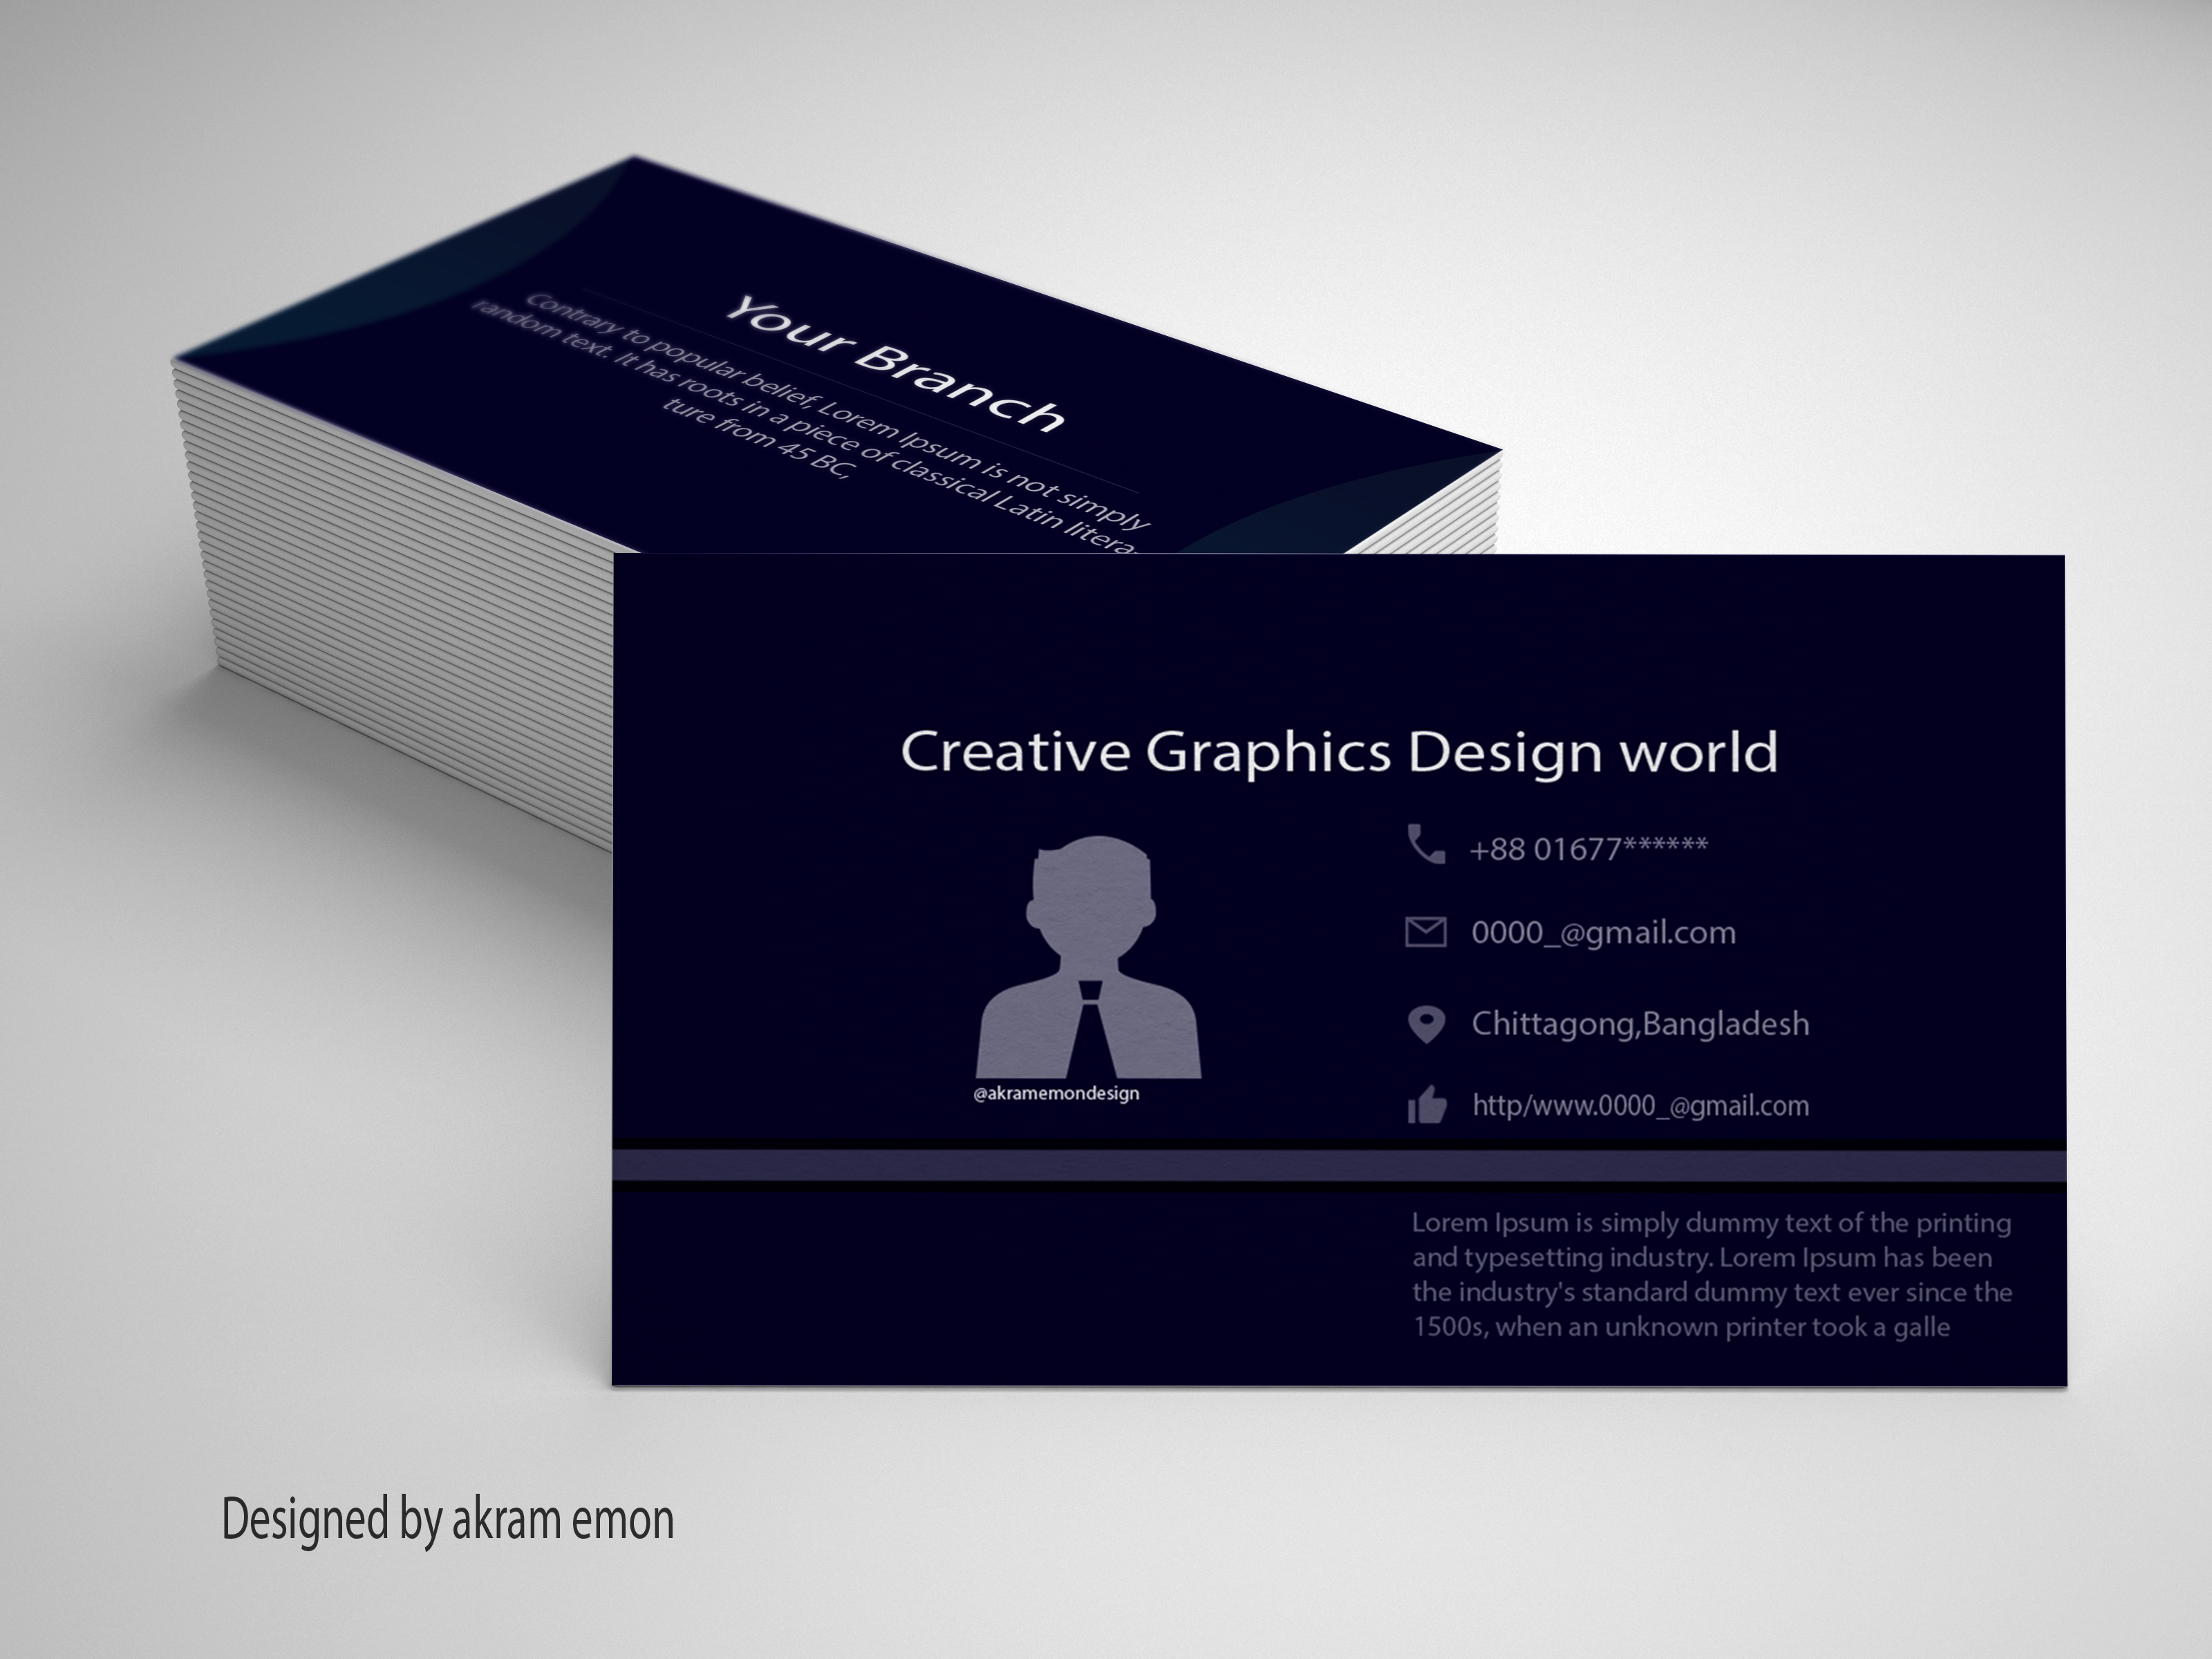 Personal Business Card Design At Fiverr Akramemon58 Personal Business Cards Creative Graphics Card Design